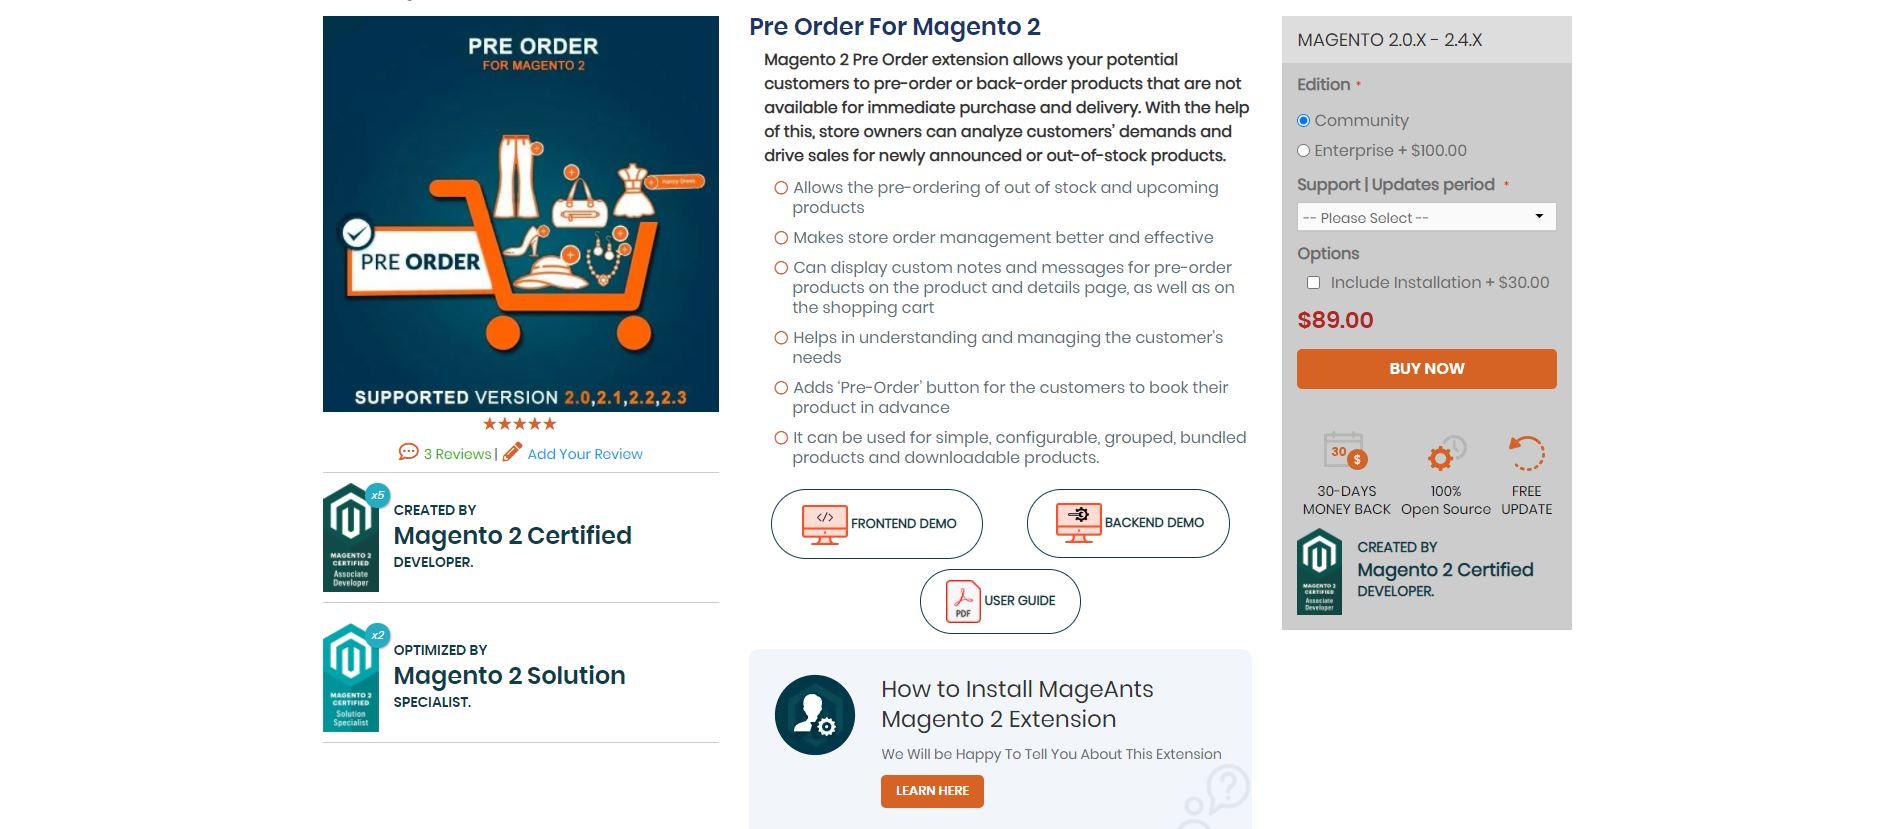 Pre-order extension Magento